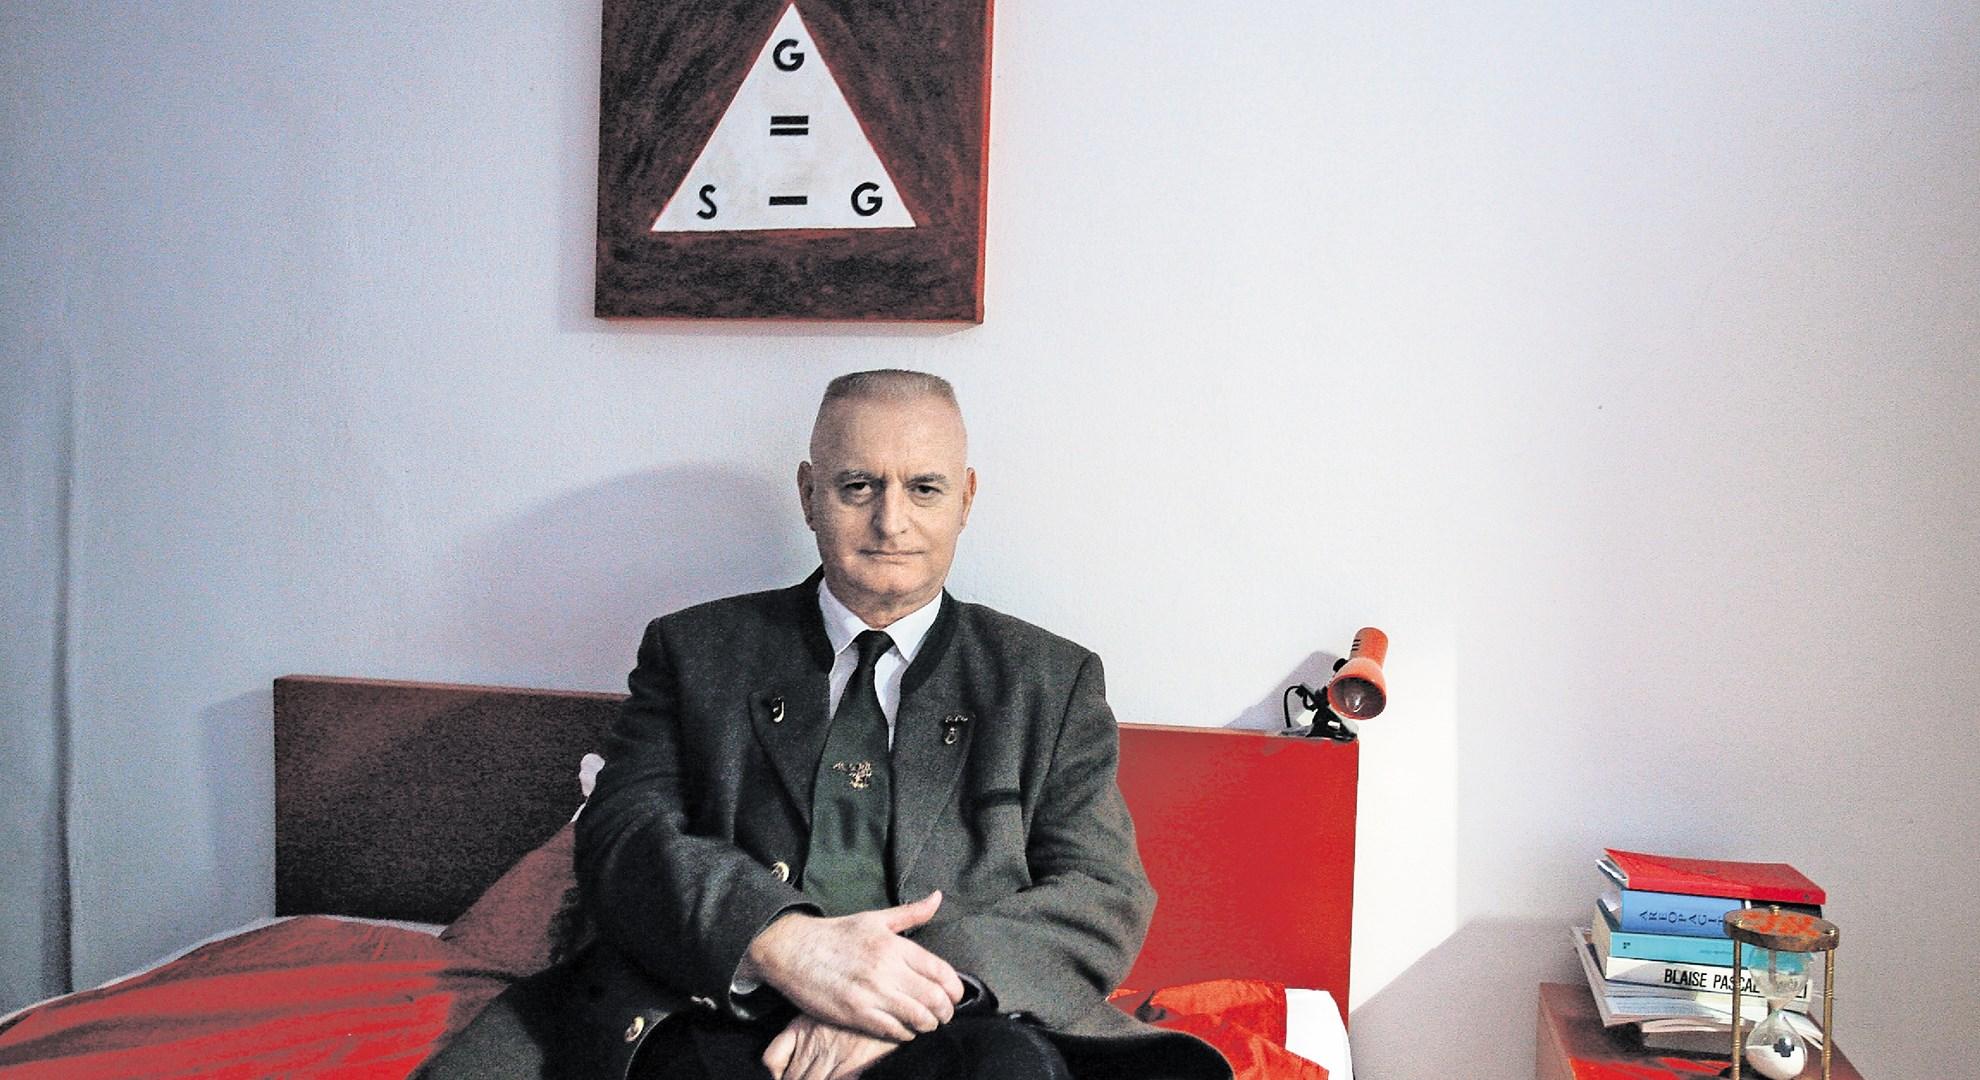 Peter Mlakar, filozof, pesnik, pisatelj in performer: »Gospod Mlakar, jaz vas nič ne razumem…«